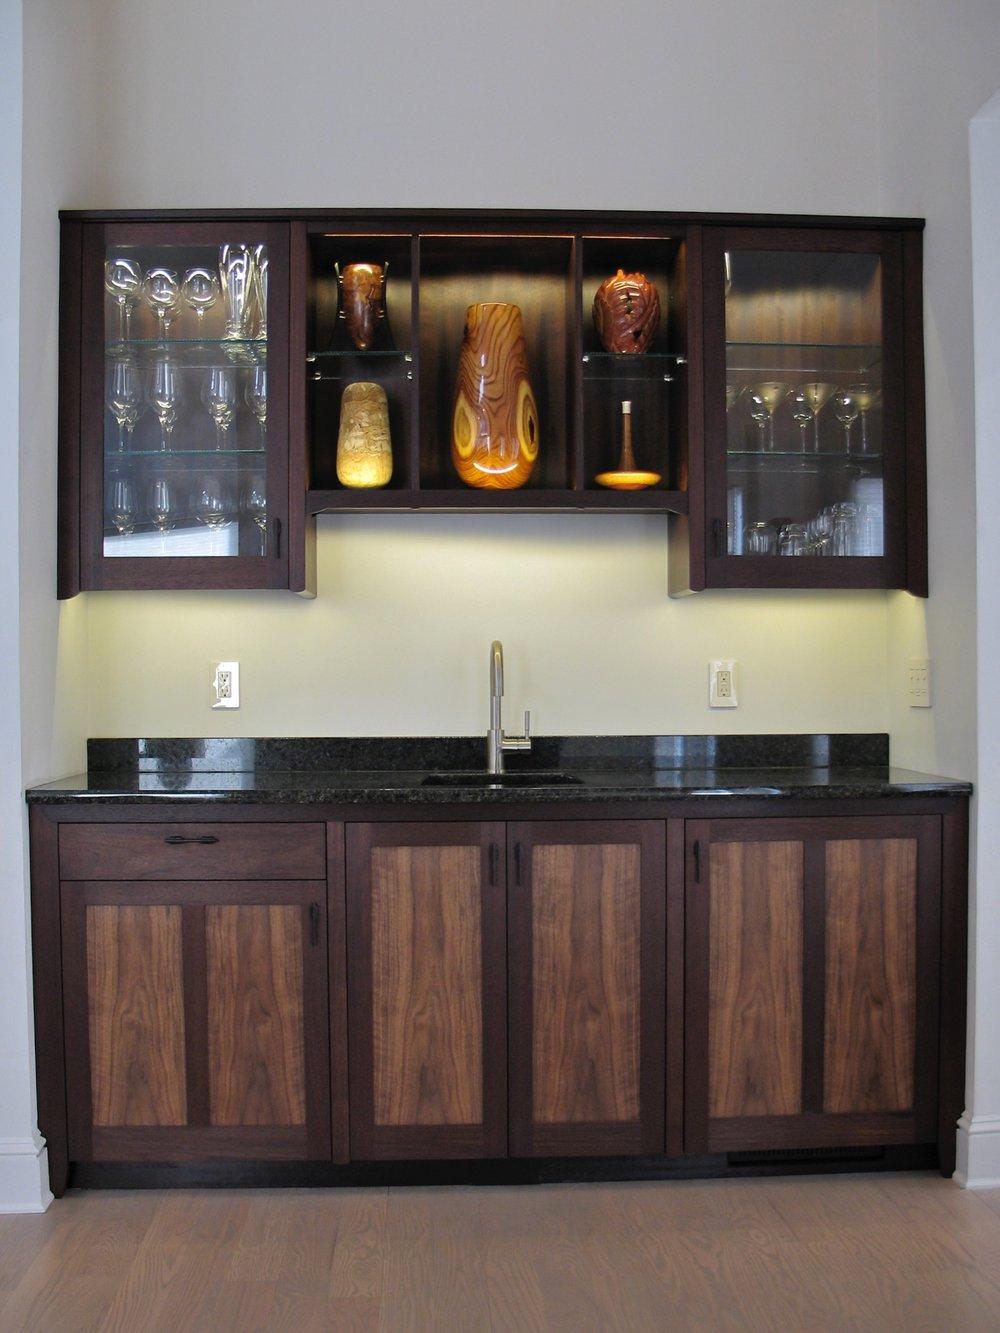 Ken's wetbar and dislplay- nogal, figured walnut, granite